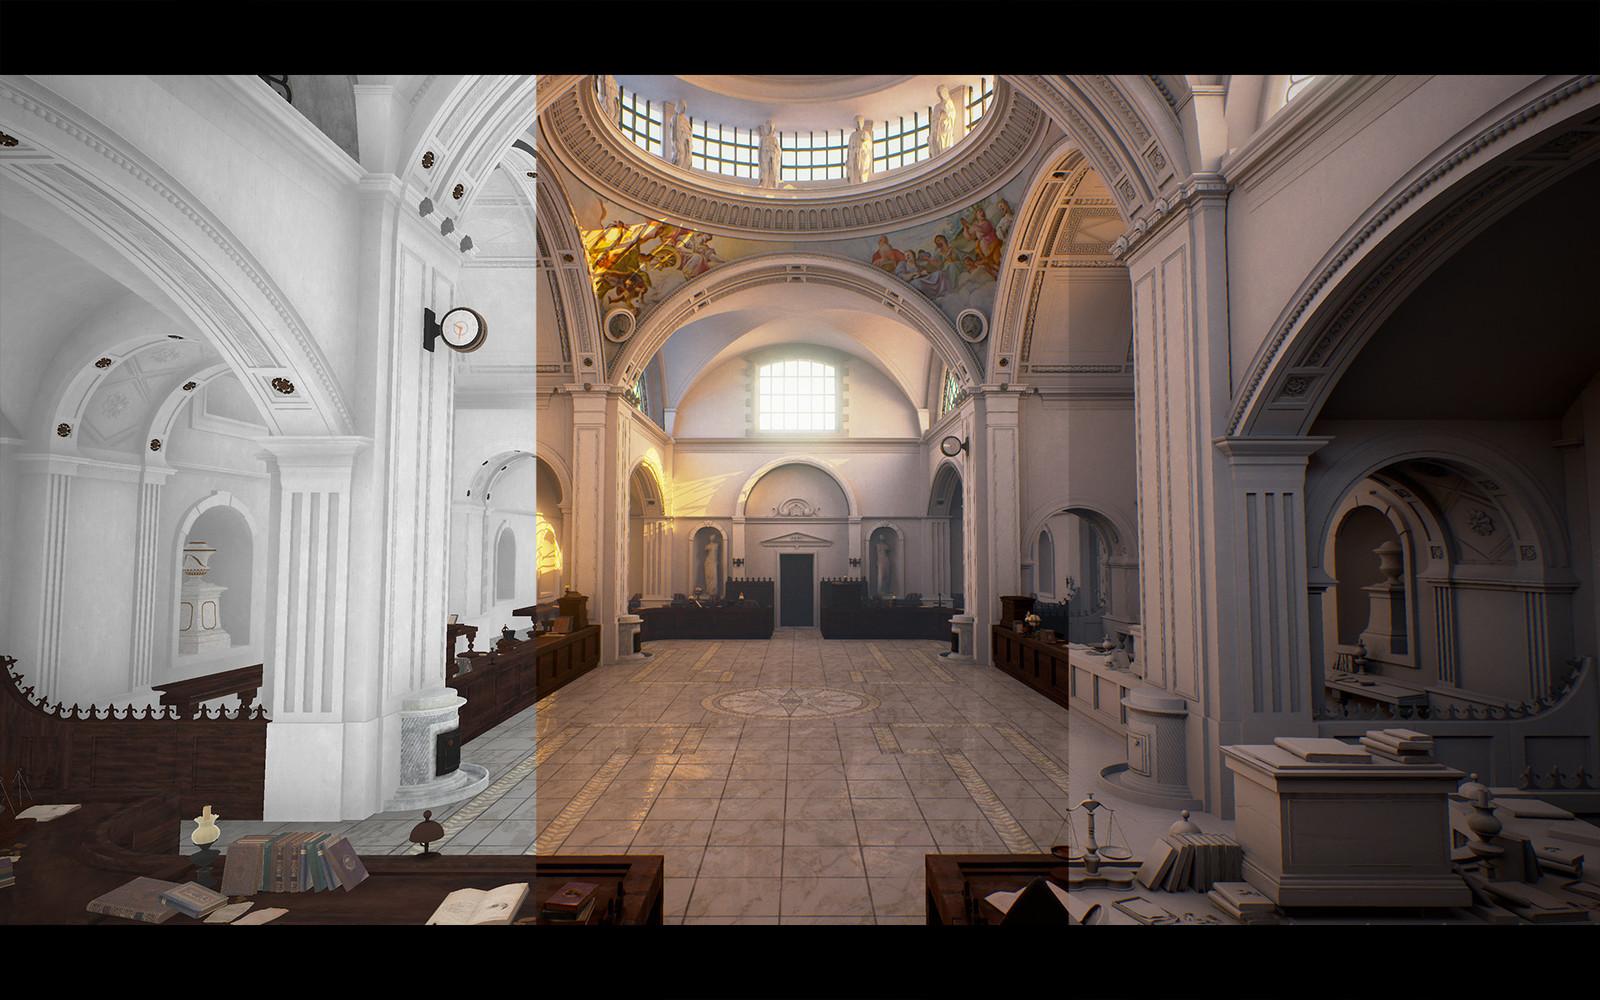 Unreal Engine 4 Breakdown / Entrance